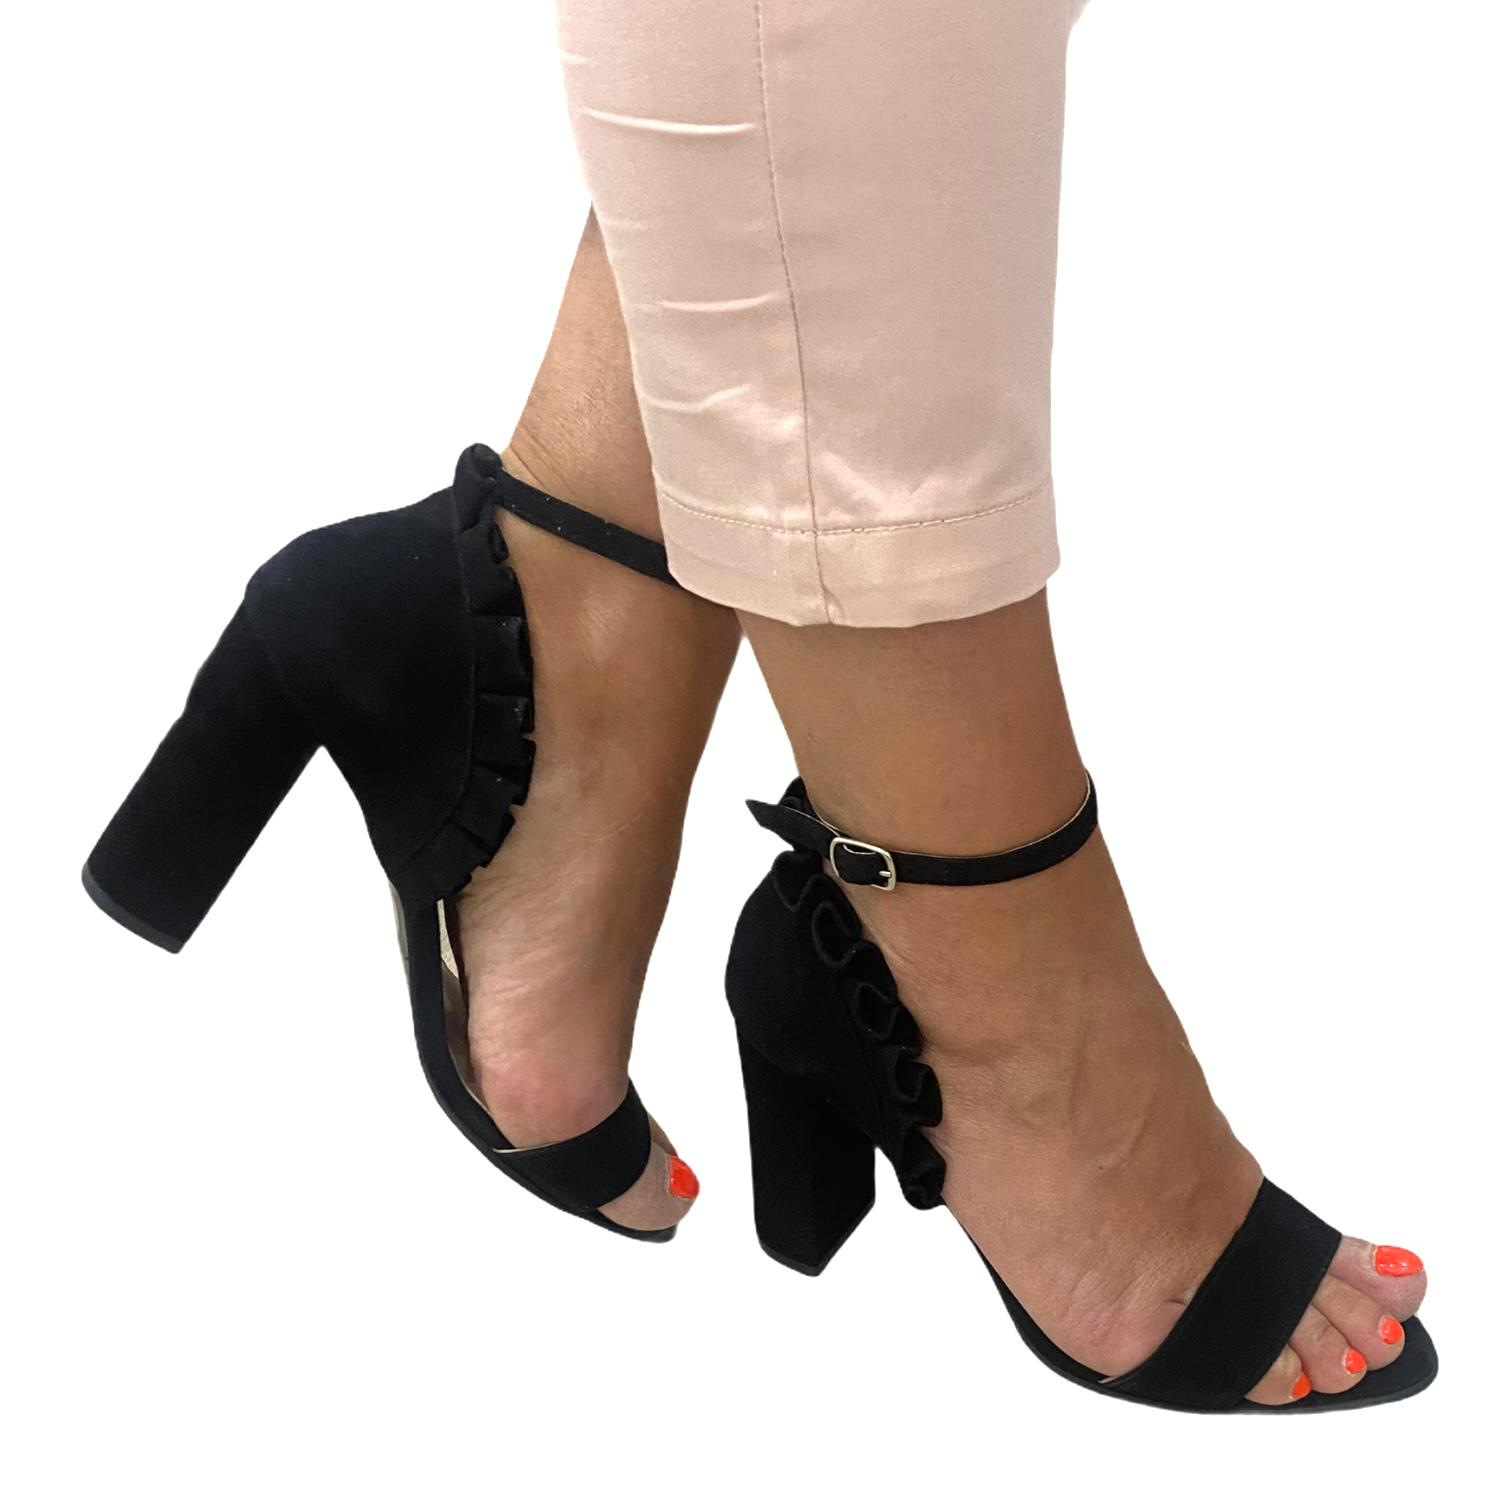 Sandale negre cu volanase